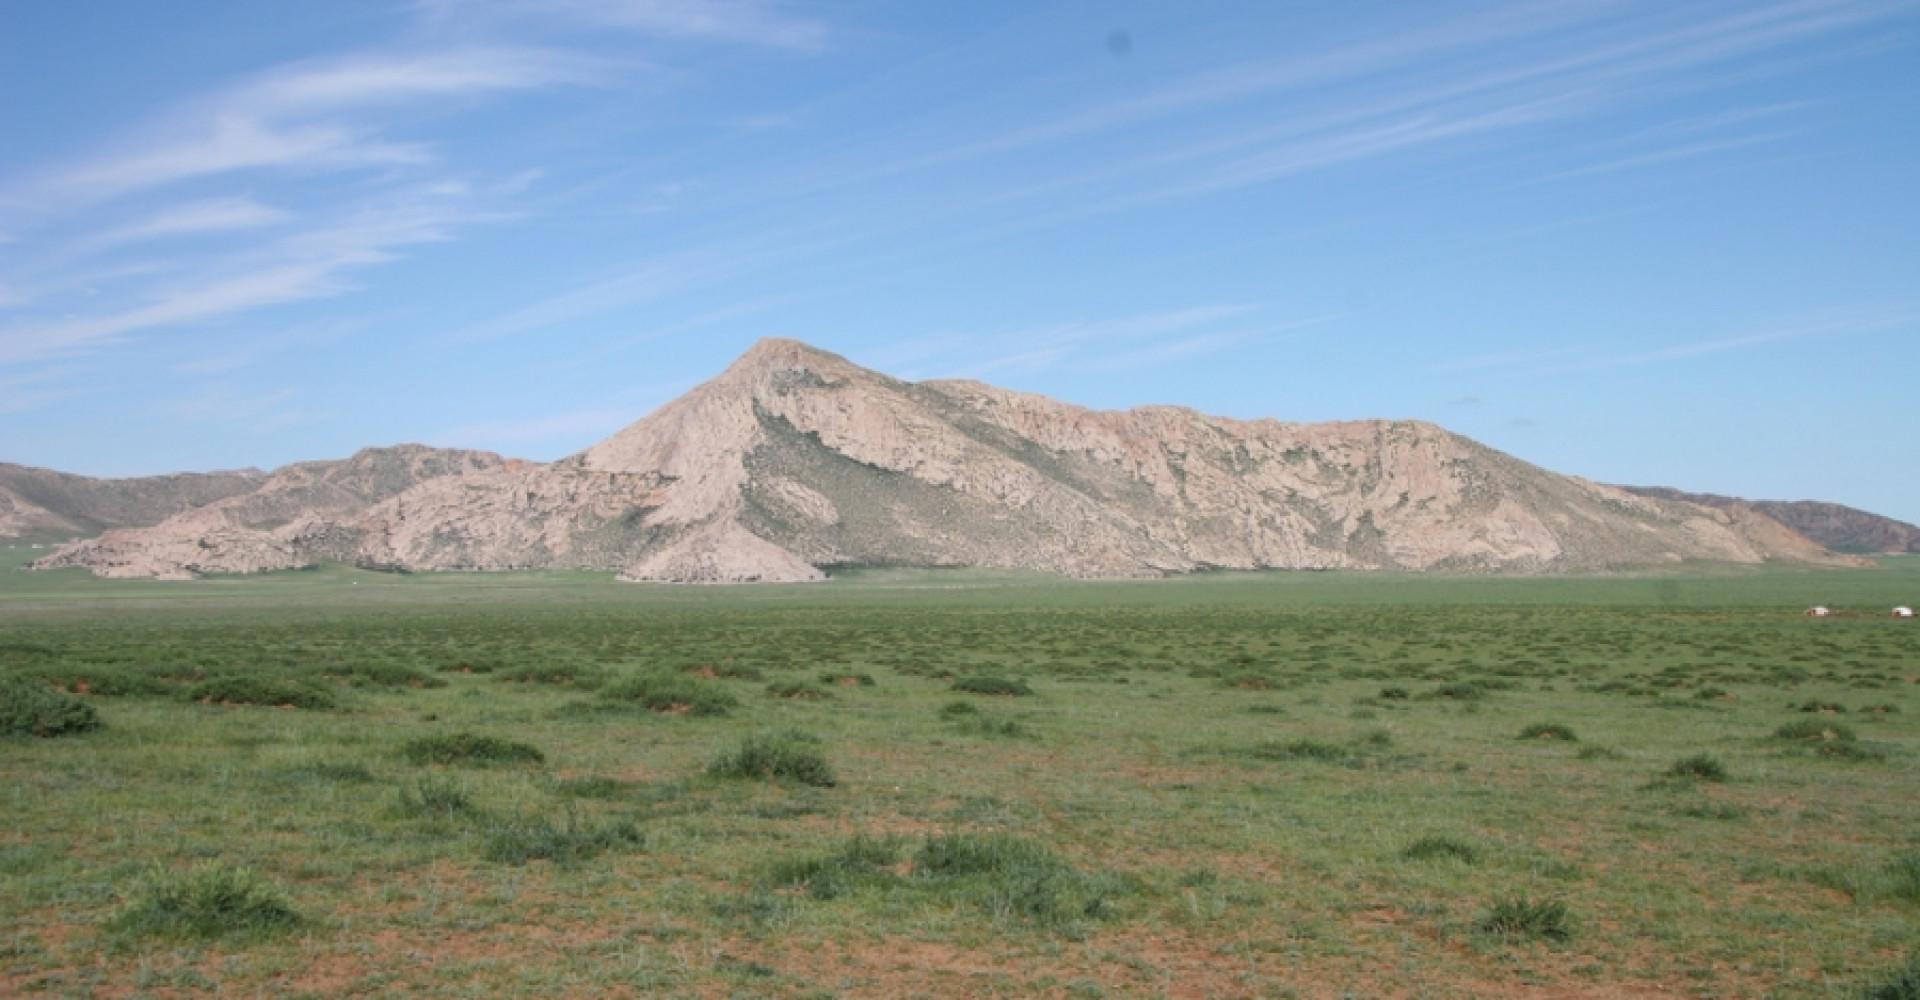 Zorgol Khairkhan Mountain